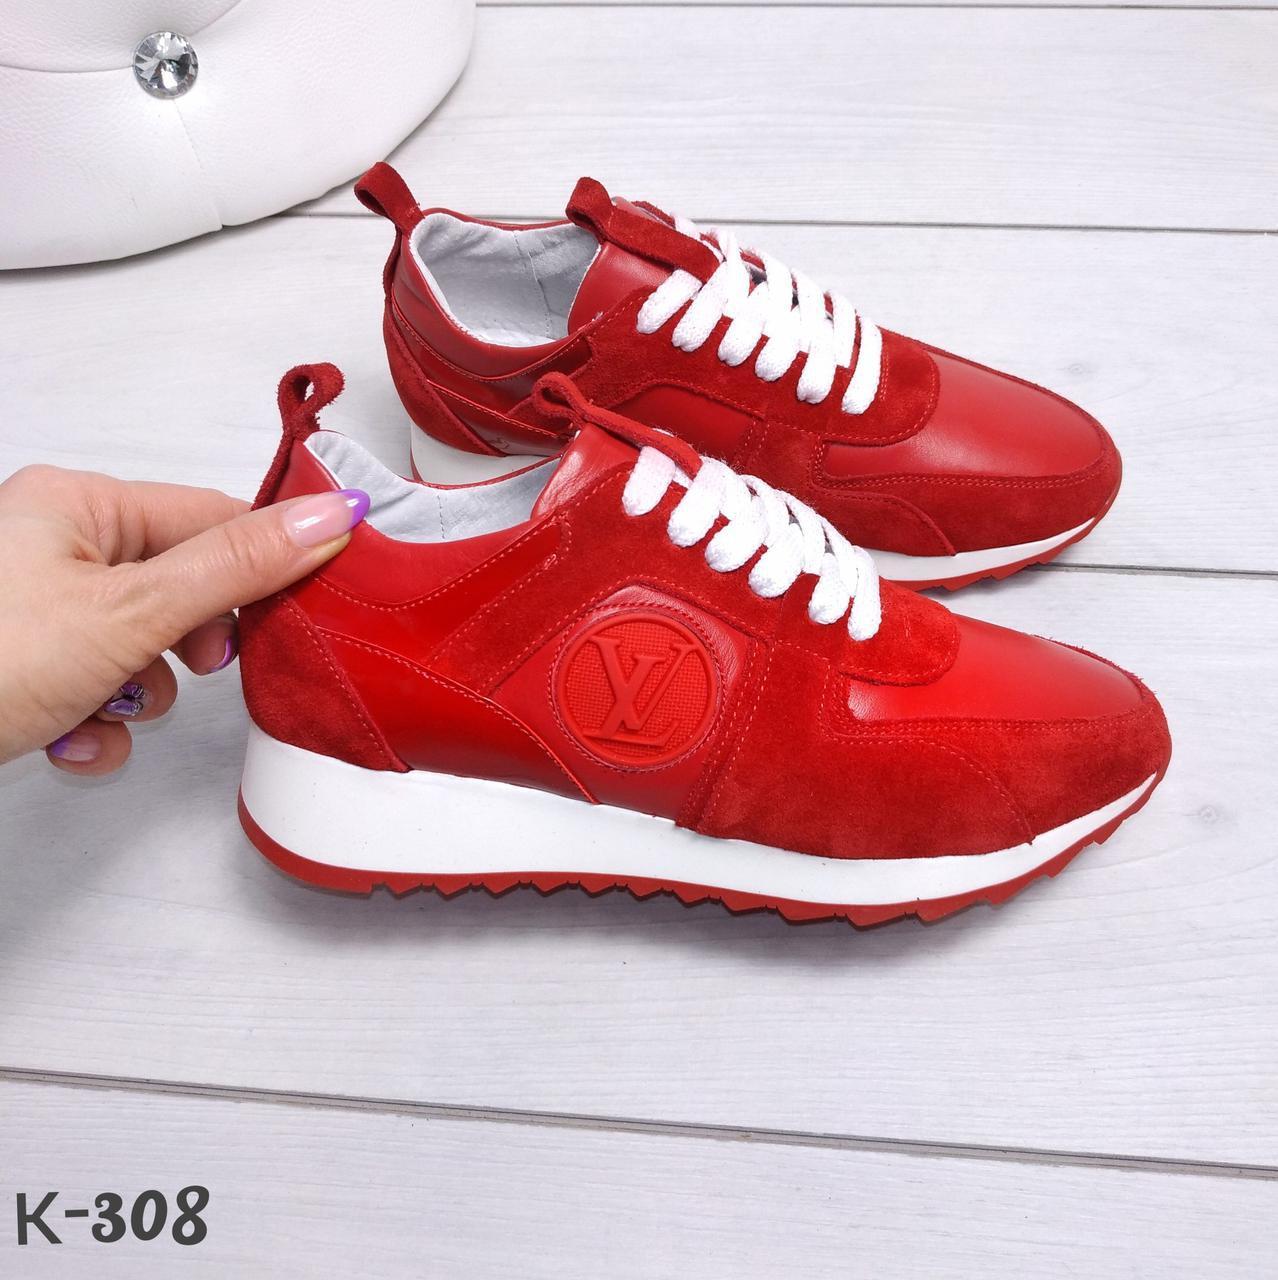 dbeda3c82752 Женские красные замшевые кроссовки Louis Vuitton -